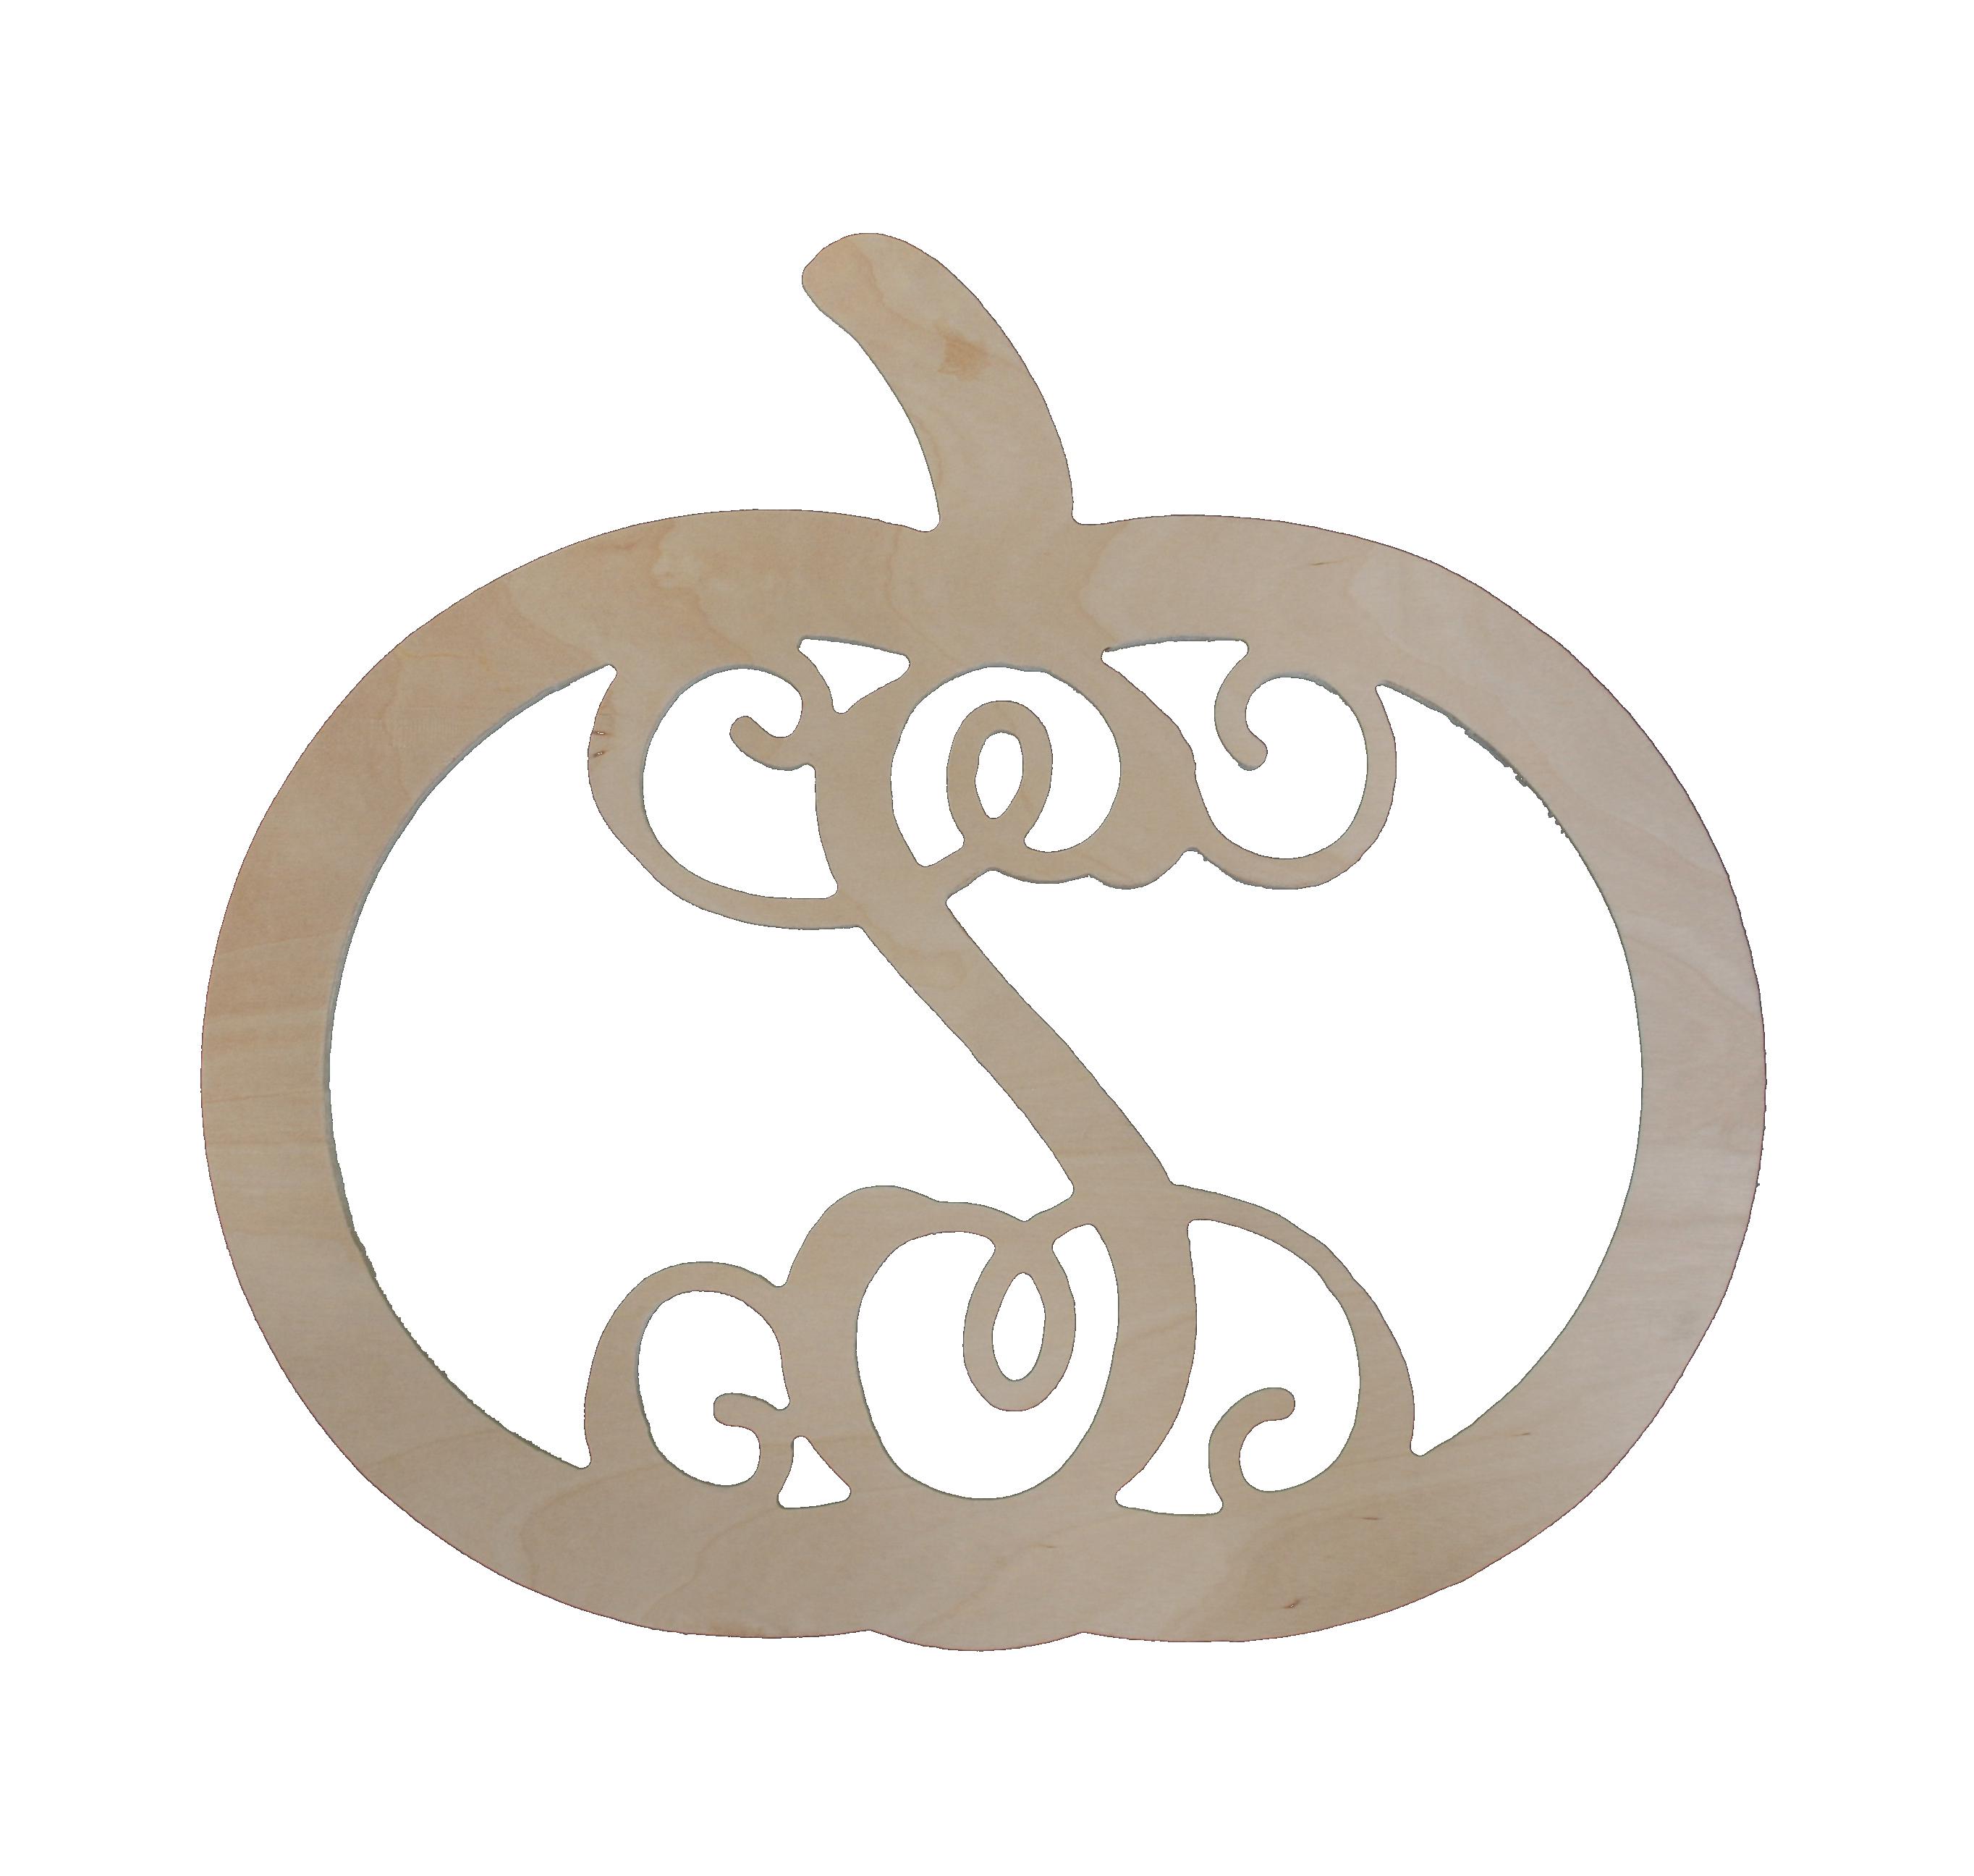 Aztec pumpkin monogram clipart image transparent stock Products Archive - DBA Monogram image transparent stock